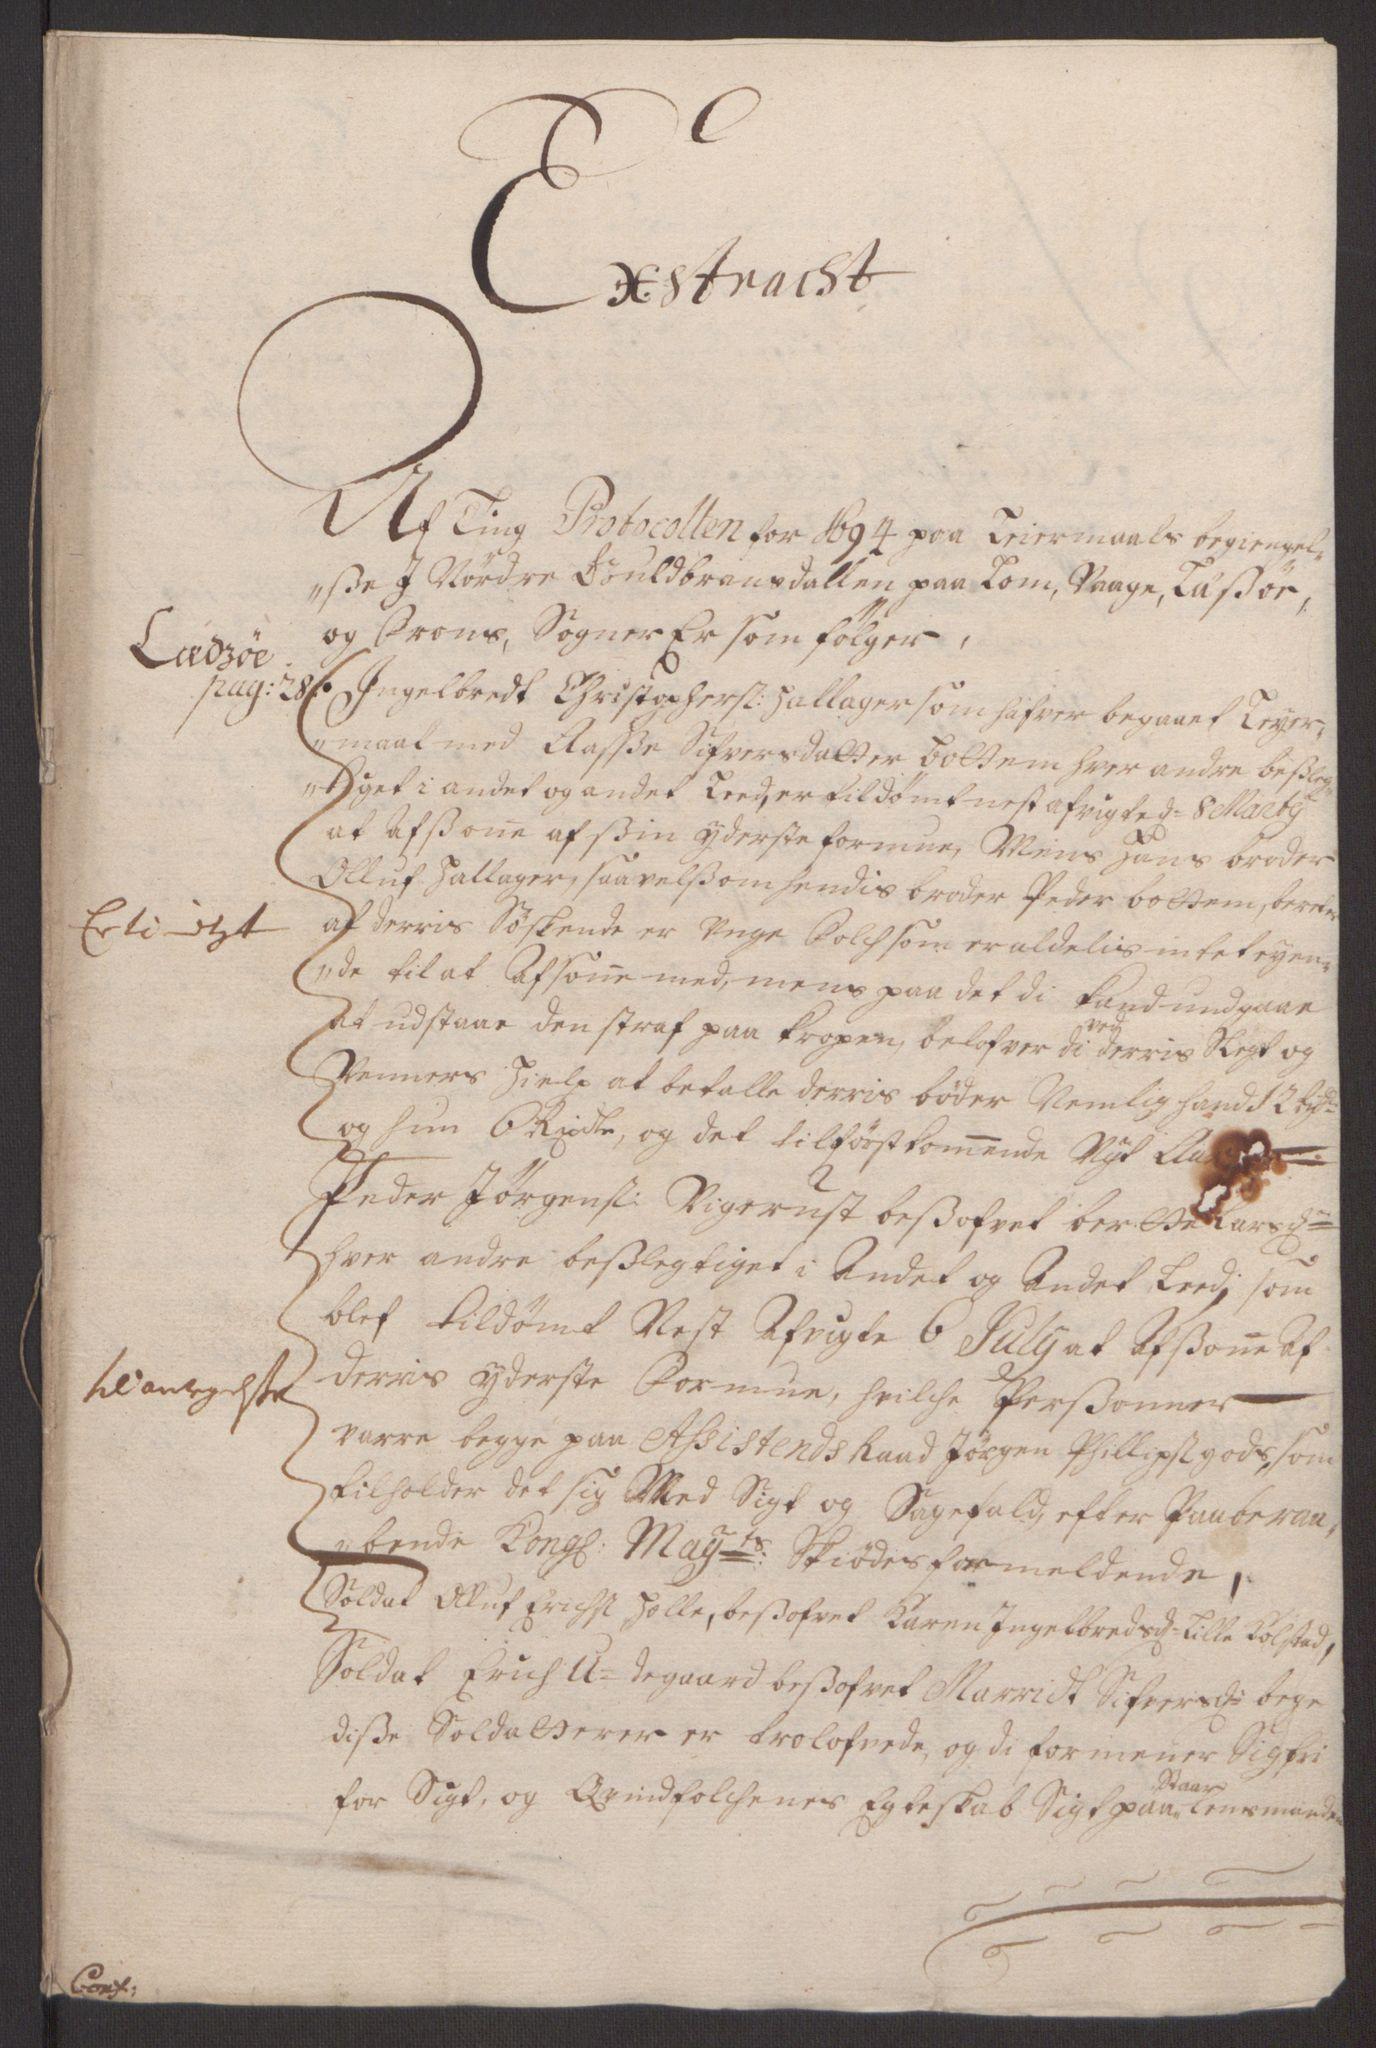 RA, Rentekammeret inntil 1814, Reviderte regnskaper, Fogderegnskap, R17/L1168: Fogderegnskap Gudbrandsdal, 1694, s. 271